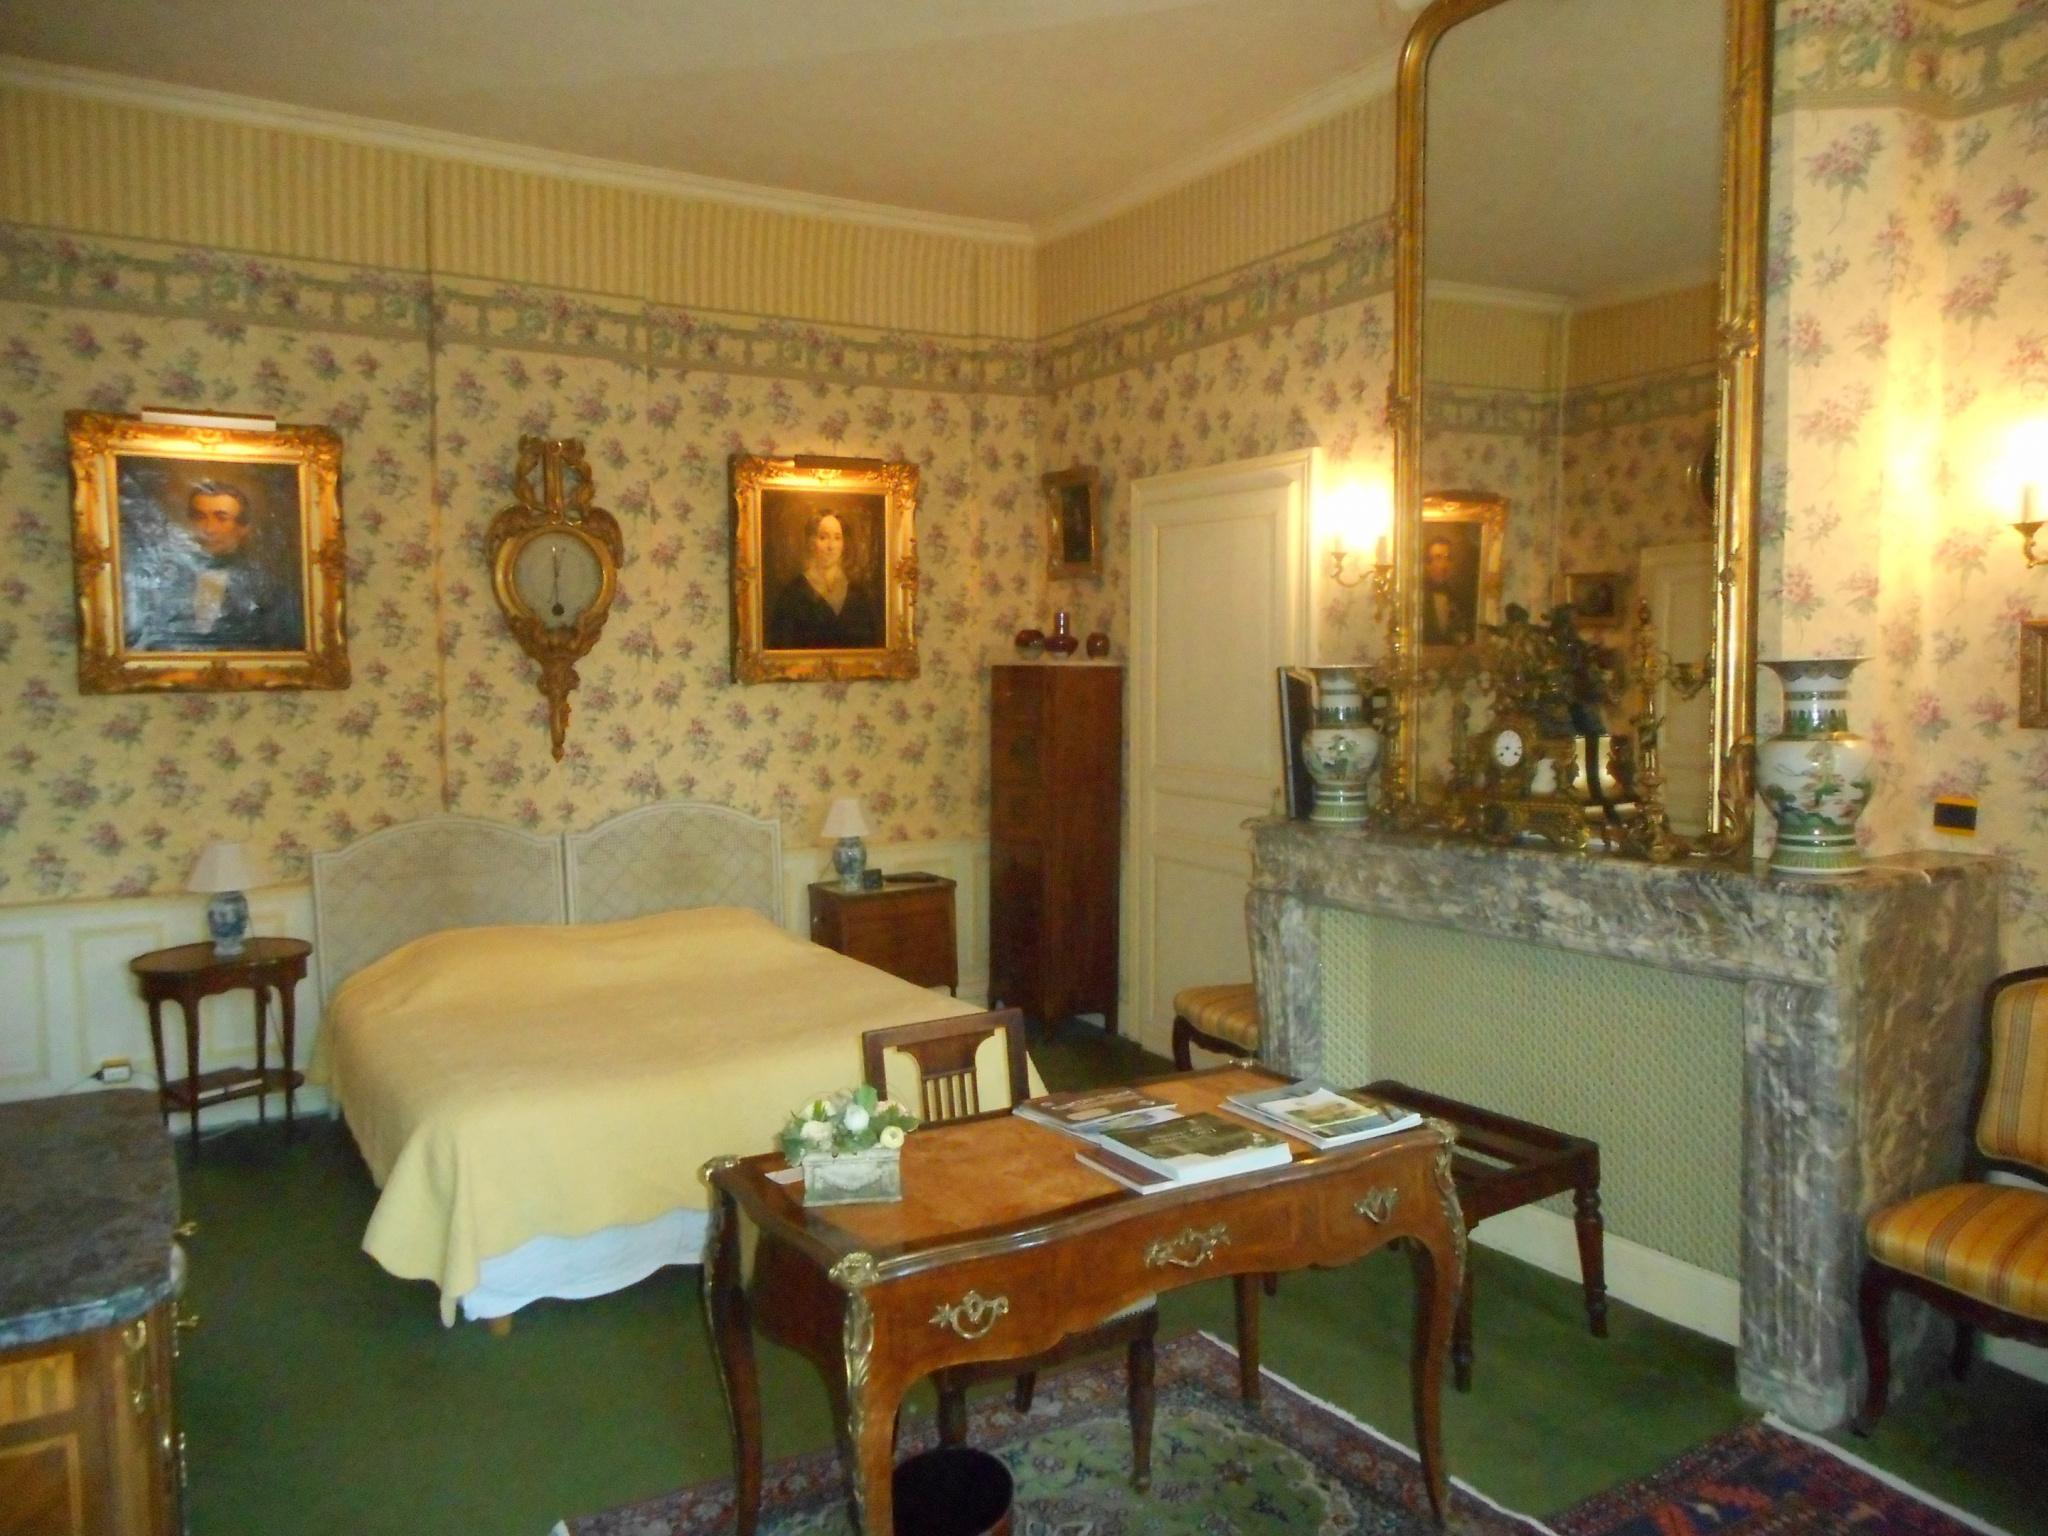 Chateau Jenlain chambre d hotes   Annie Caillier 0683162981